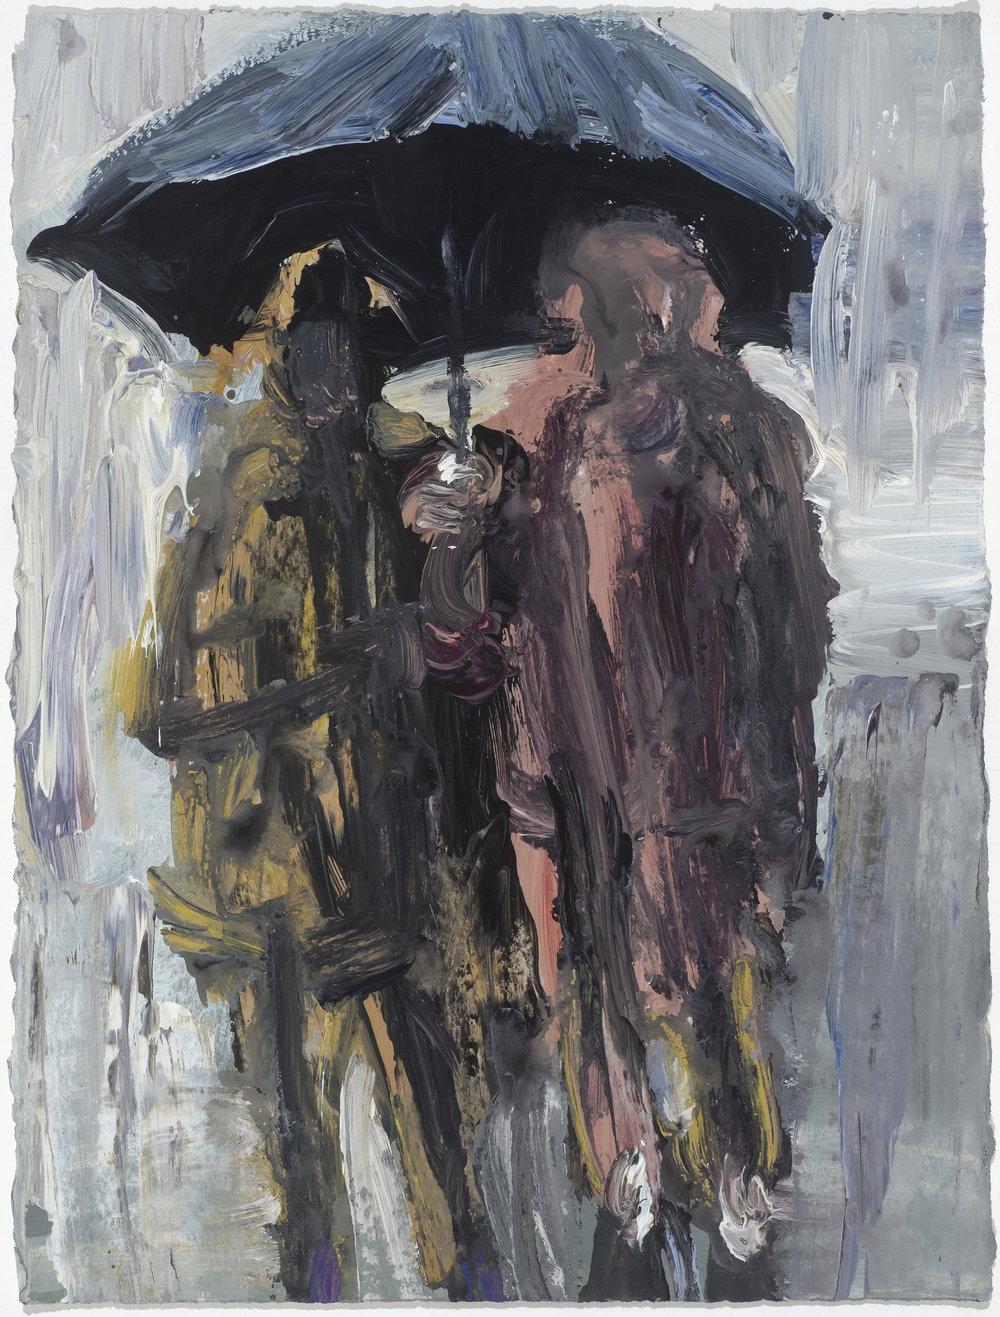 2 Under umbrella 10/16  傘下的兩人10/16   Euan Macleod , 2016  Acrylic on paper, 38 x 29 cm, HKD 9,800 framed